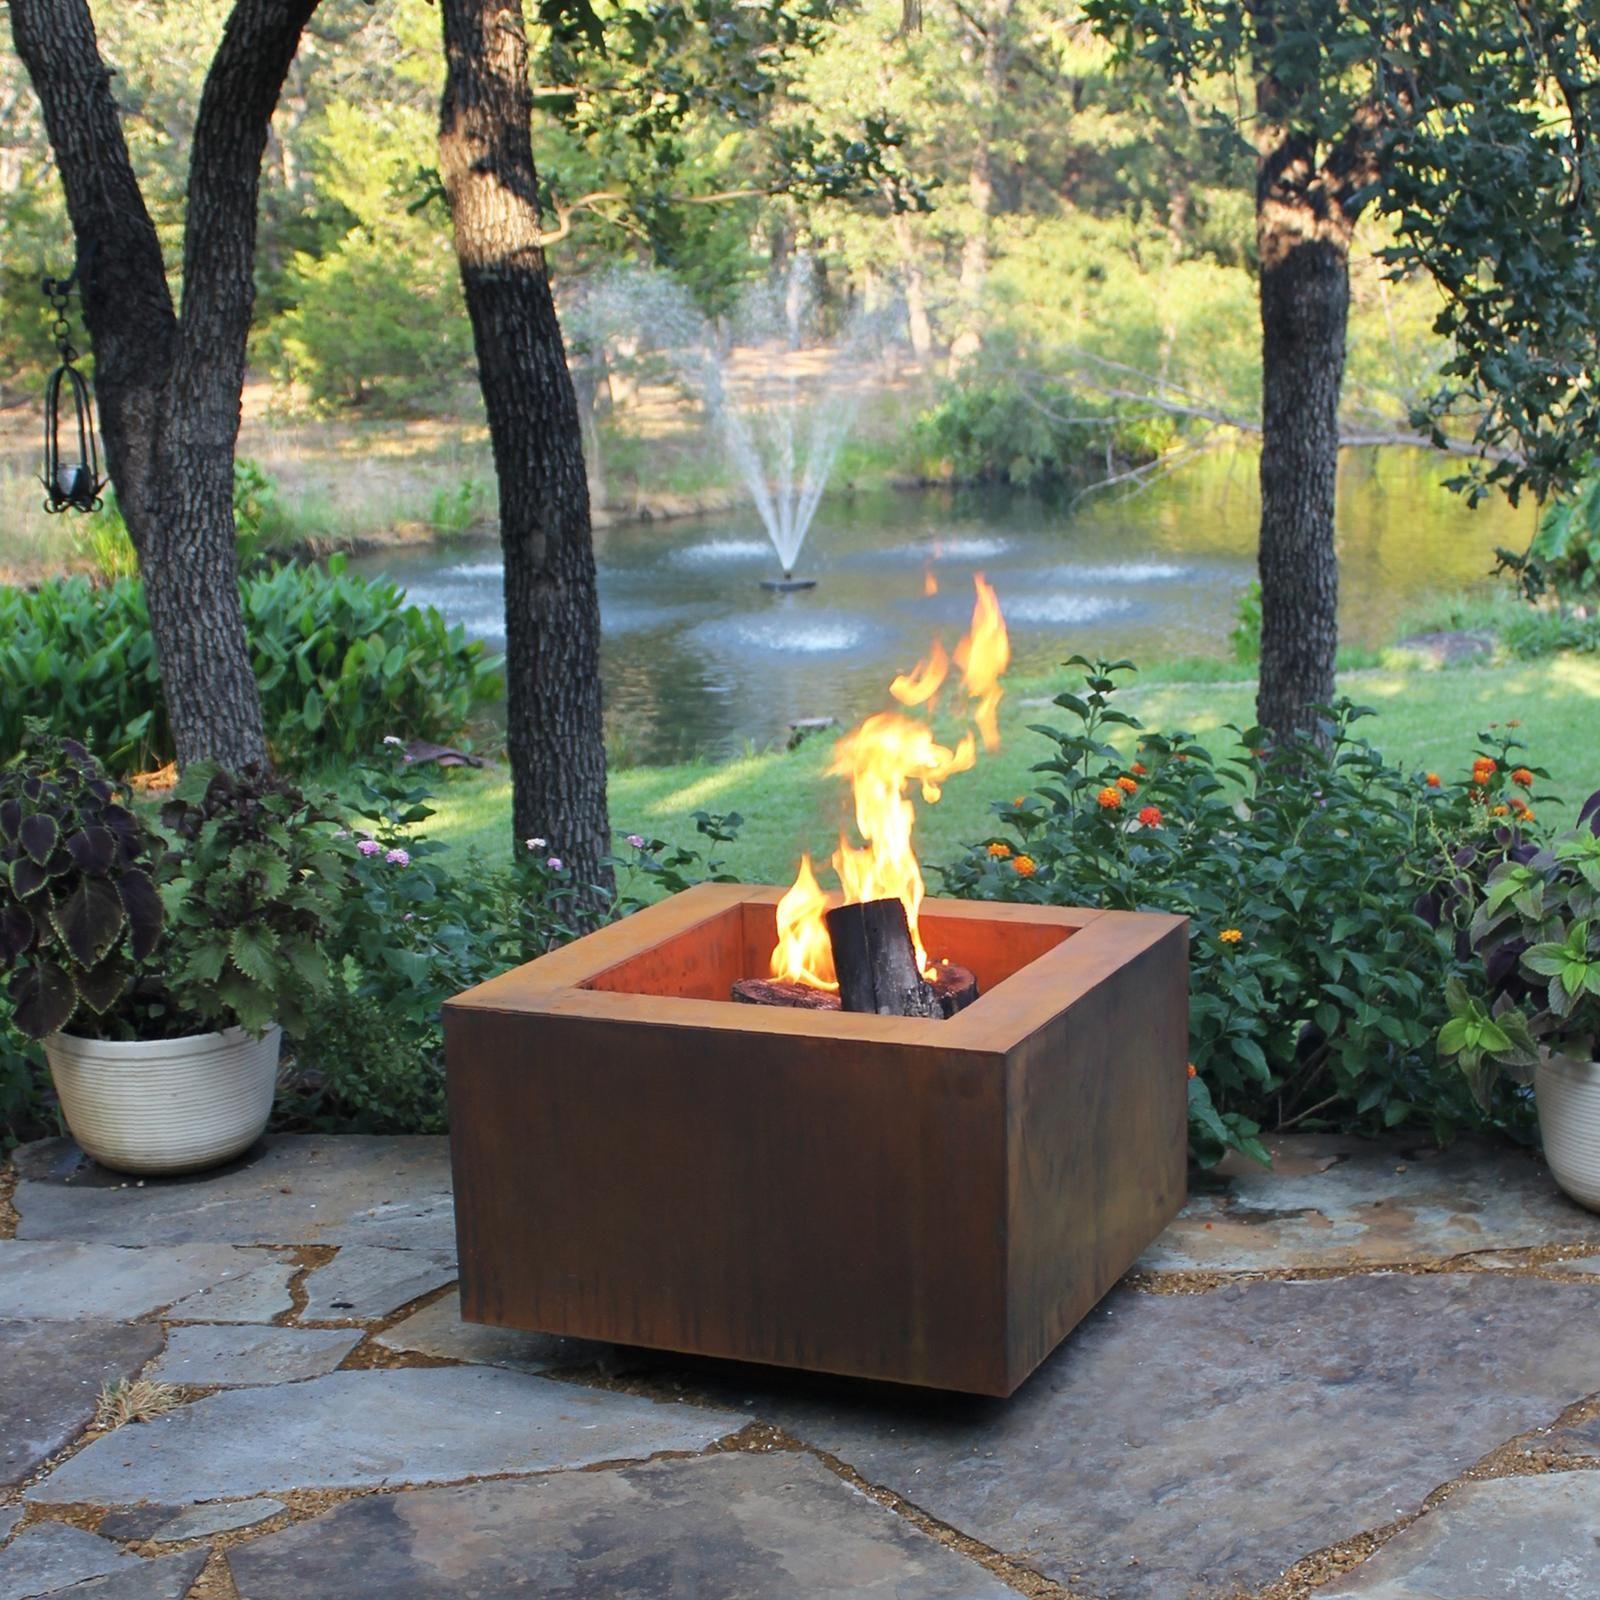 30 Square Cor Ten Steel Fire Pit Steel Fire Pit Fire Pit Backyard Square Fire Pit